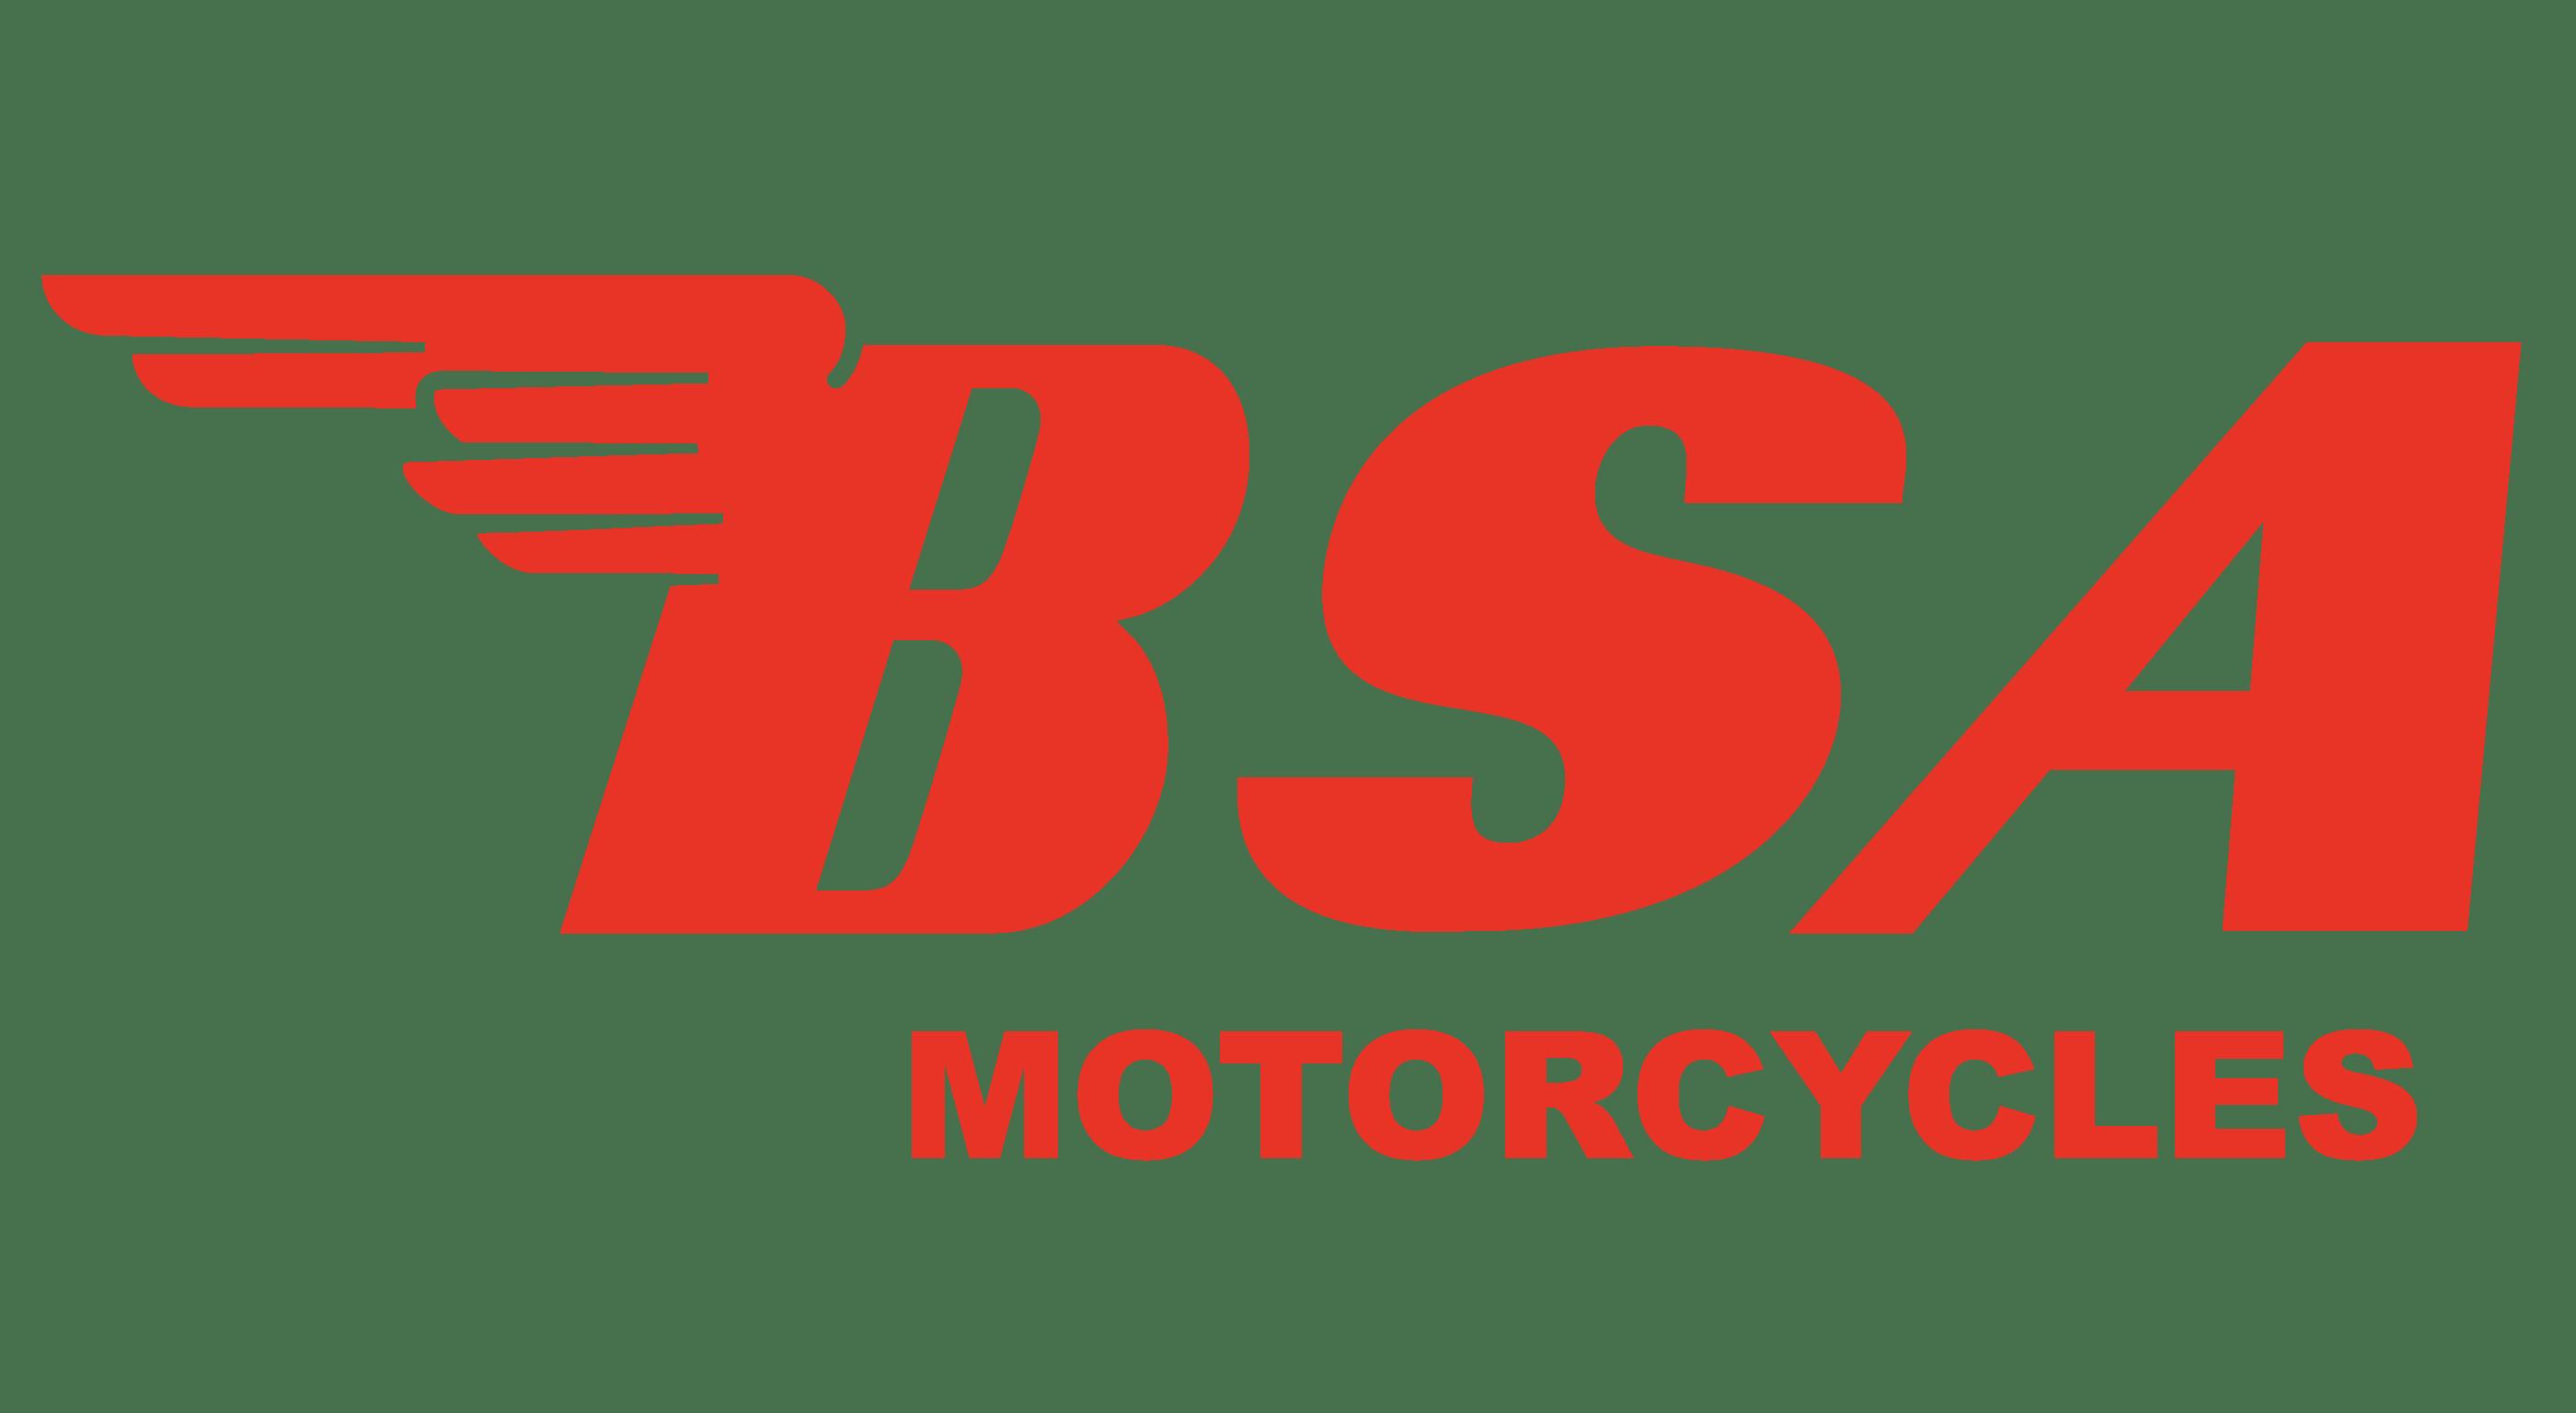 BSA Logo Motorcycles